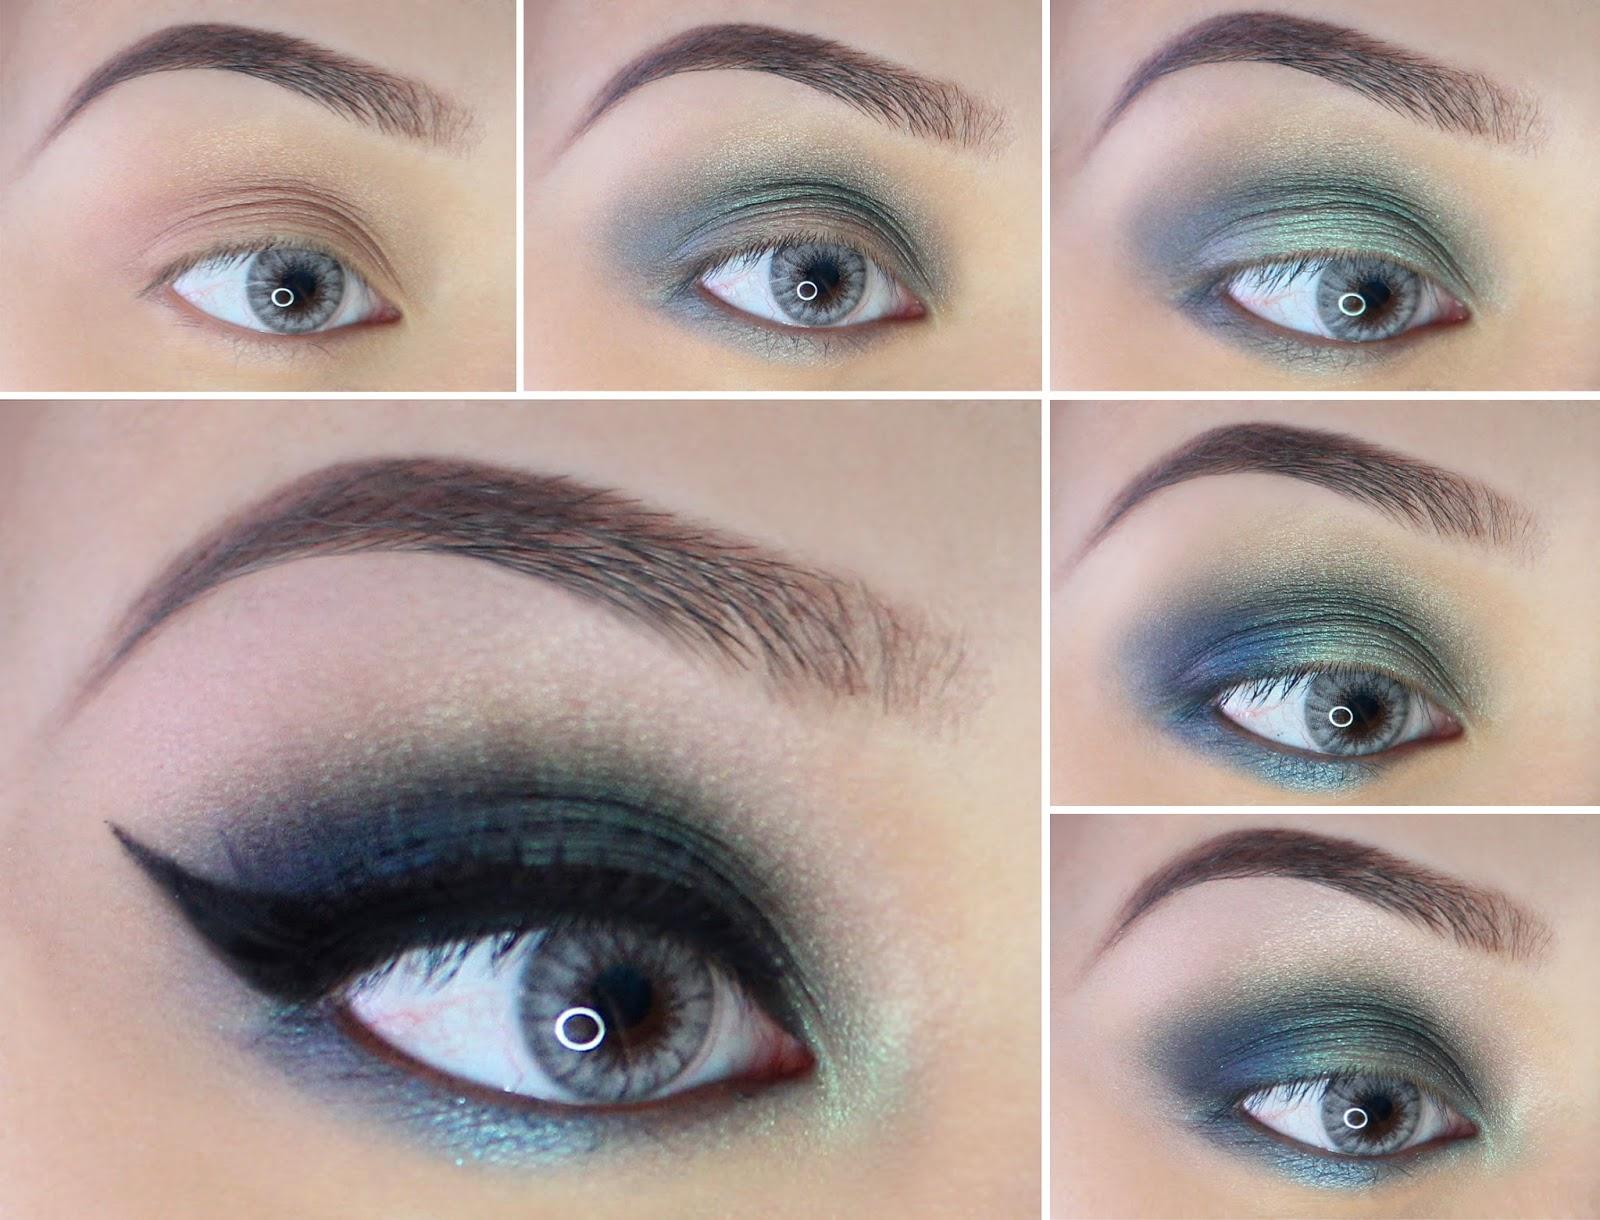 Contact: Desio Contact Lenses // Creamy Beige & Review